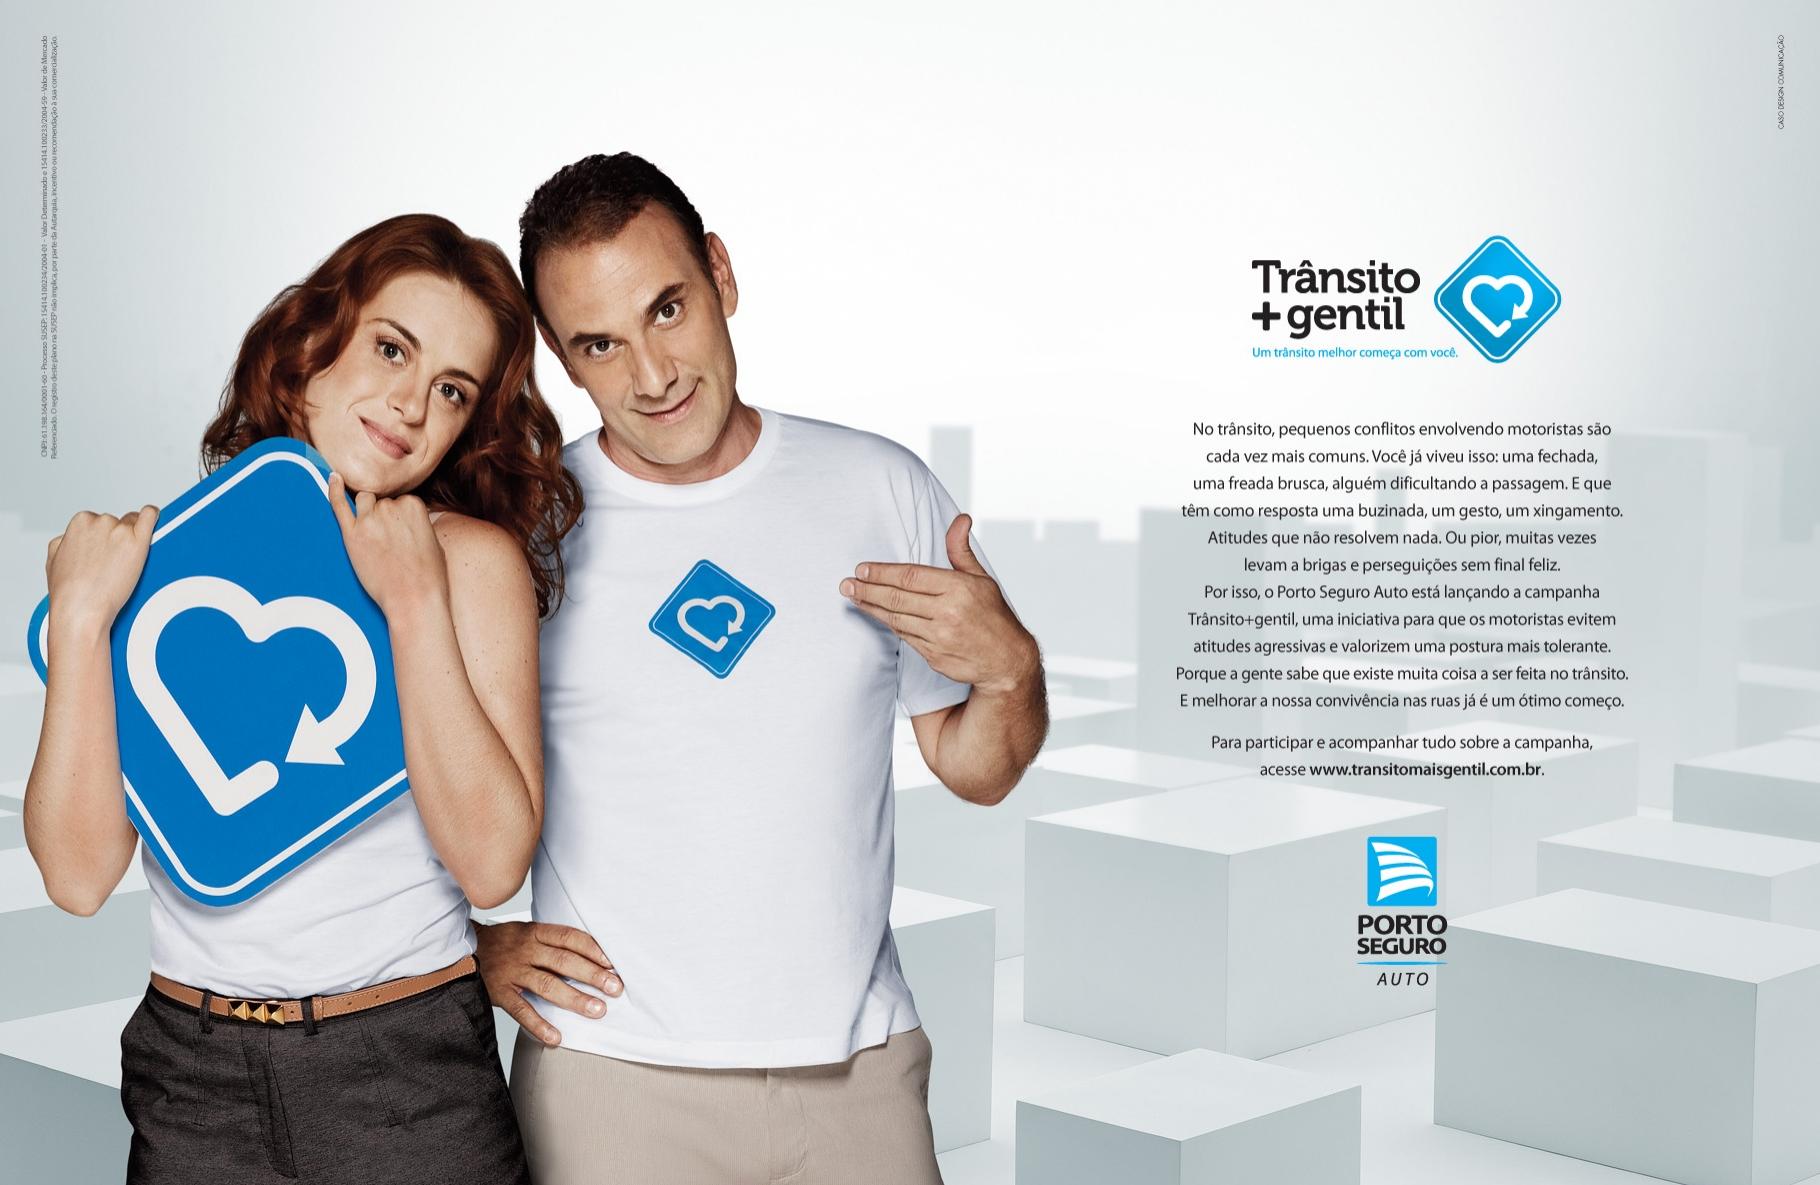 An_Transito+Gentil_VEJA-2.jpg